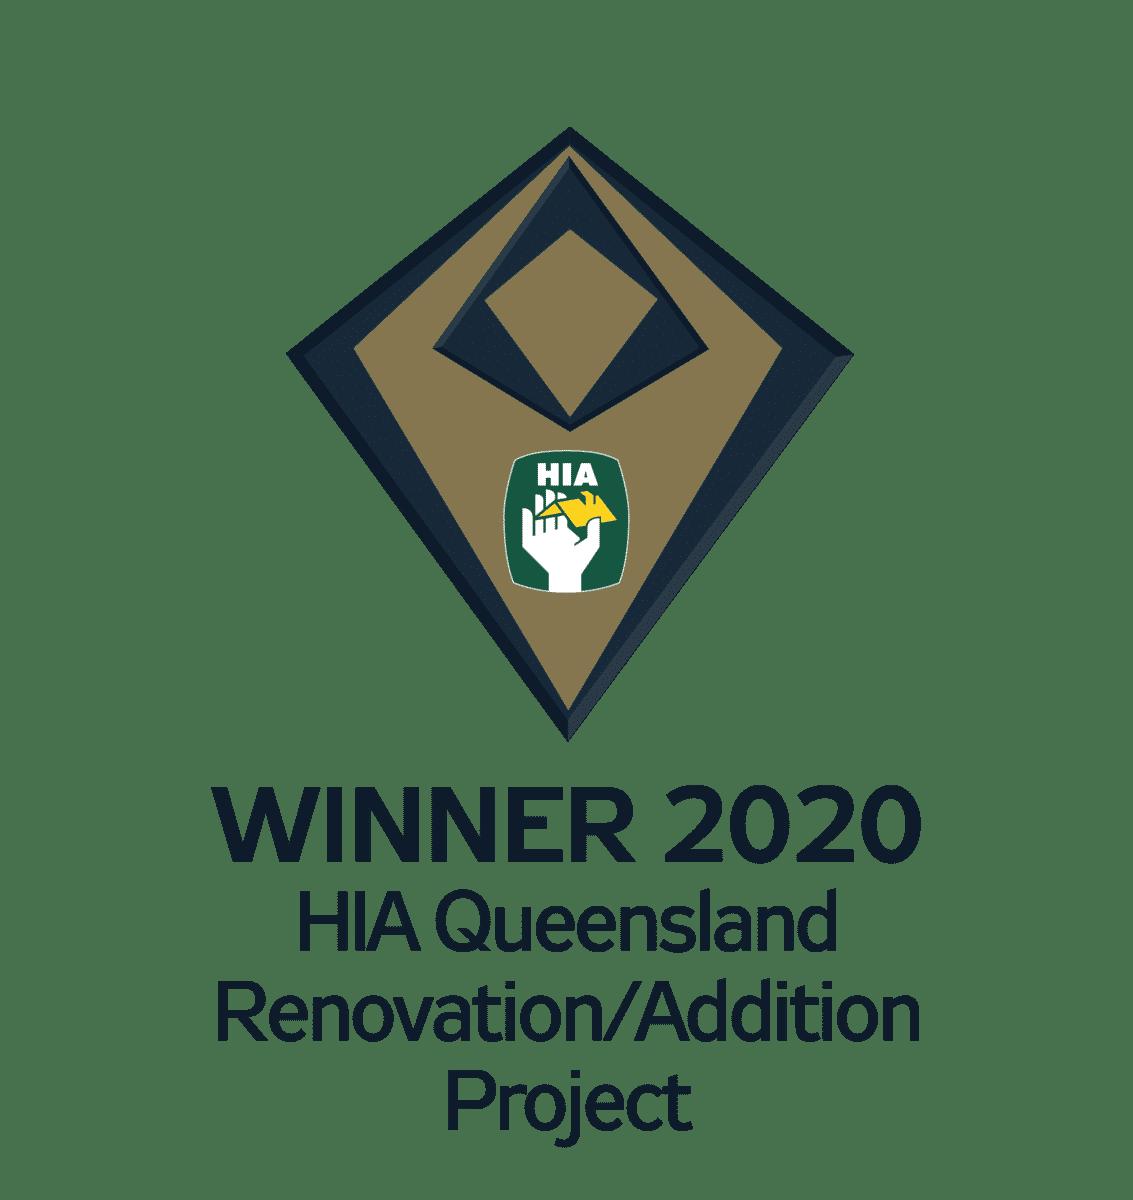 Winner 2020 Renovation/Addition Project